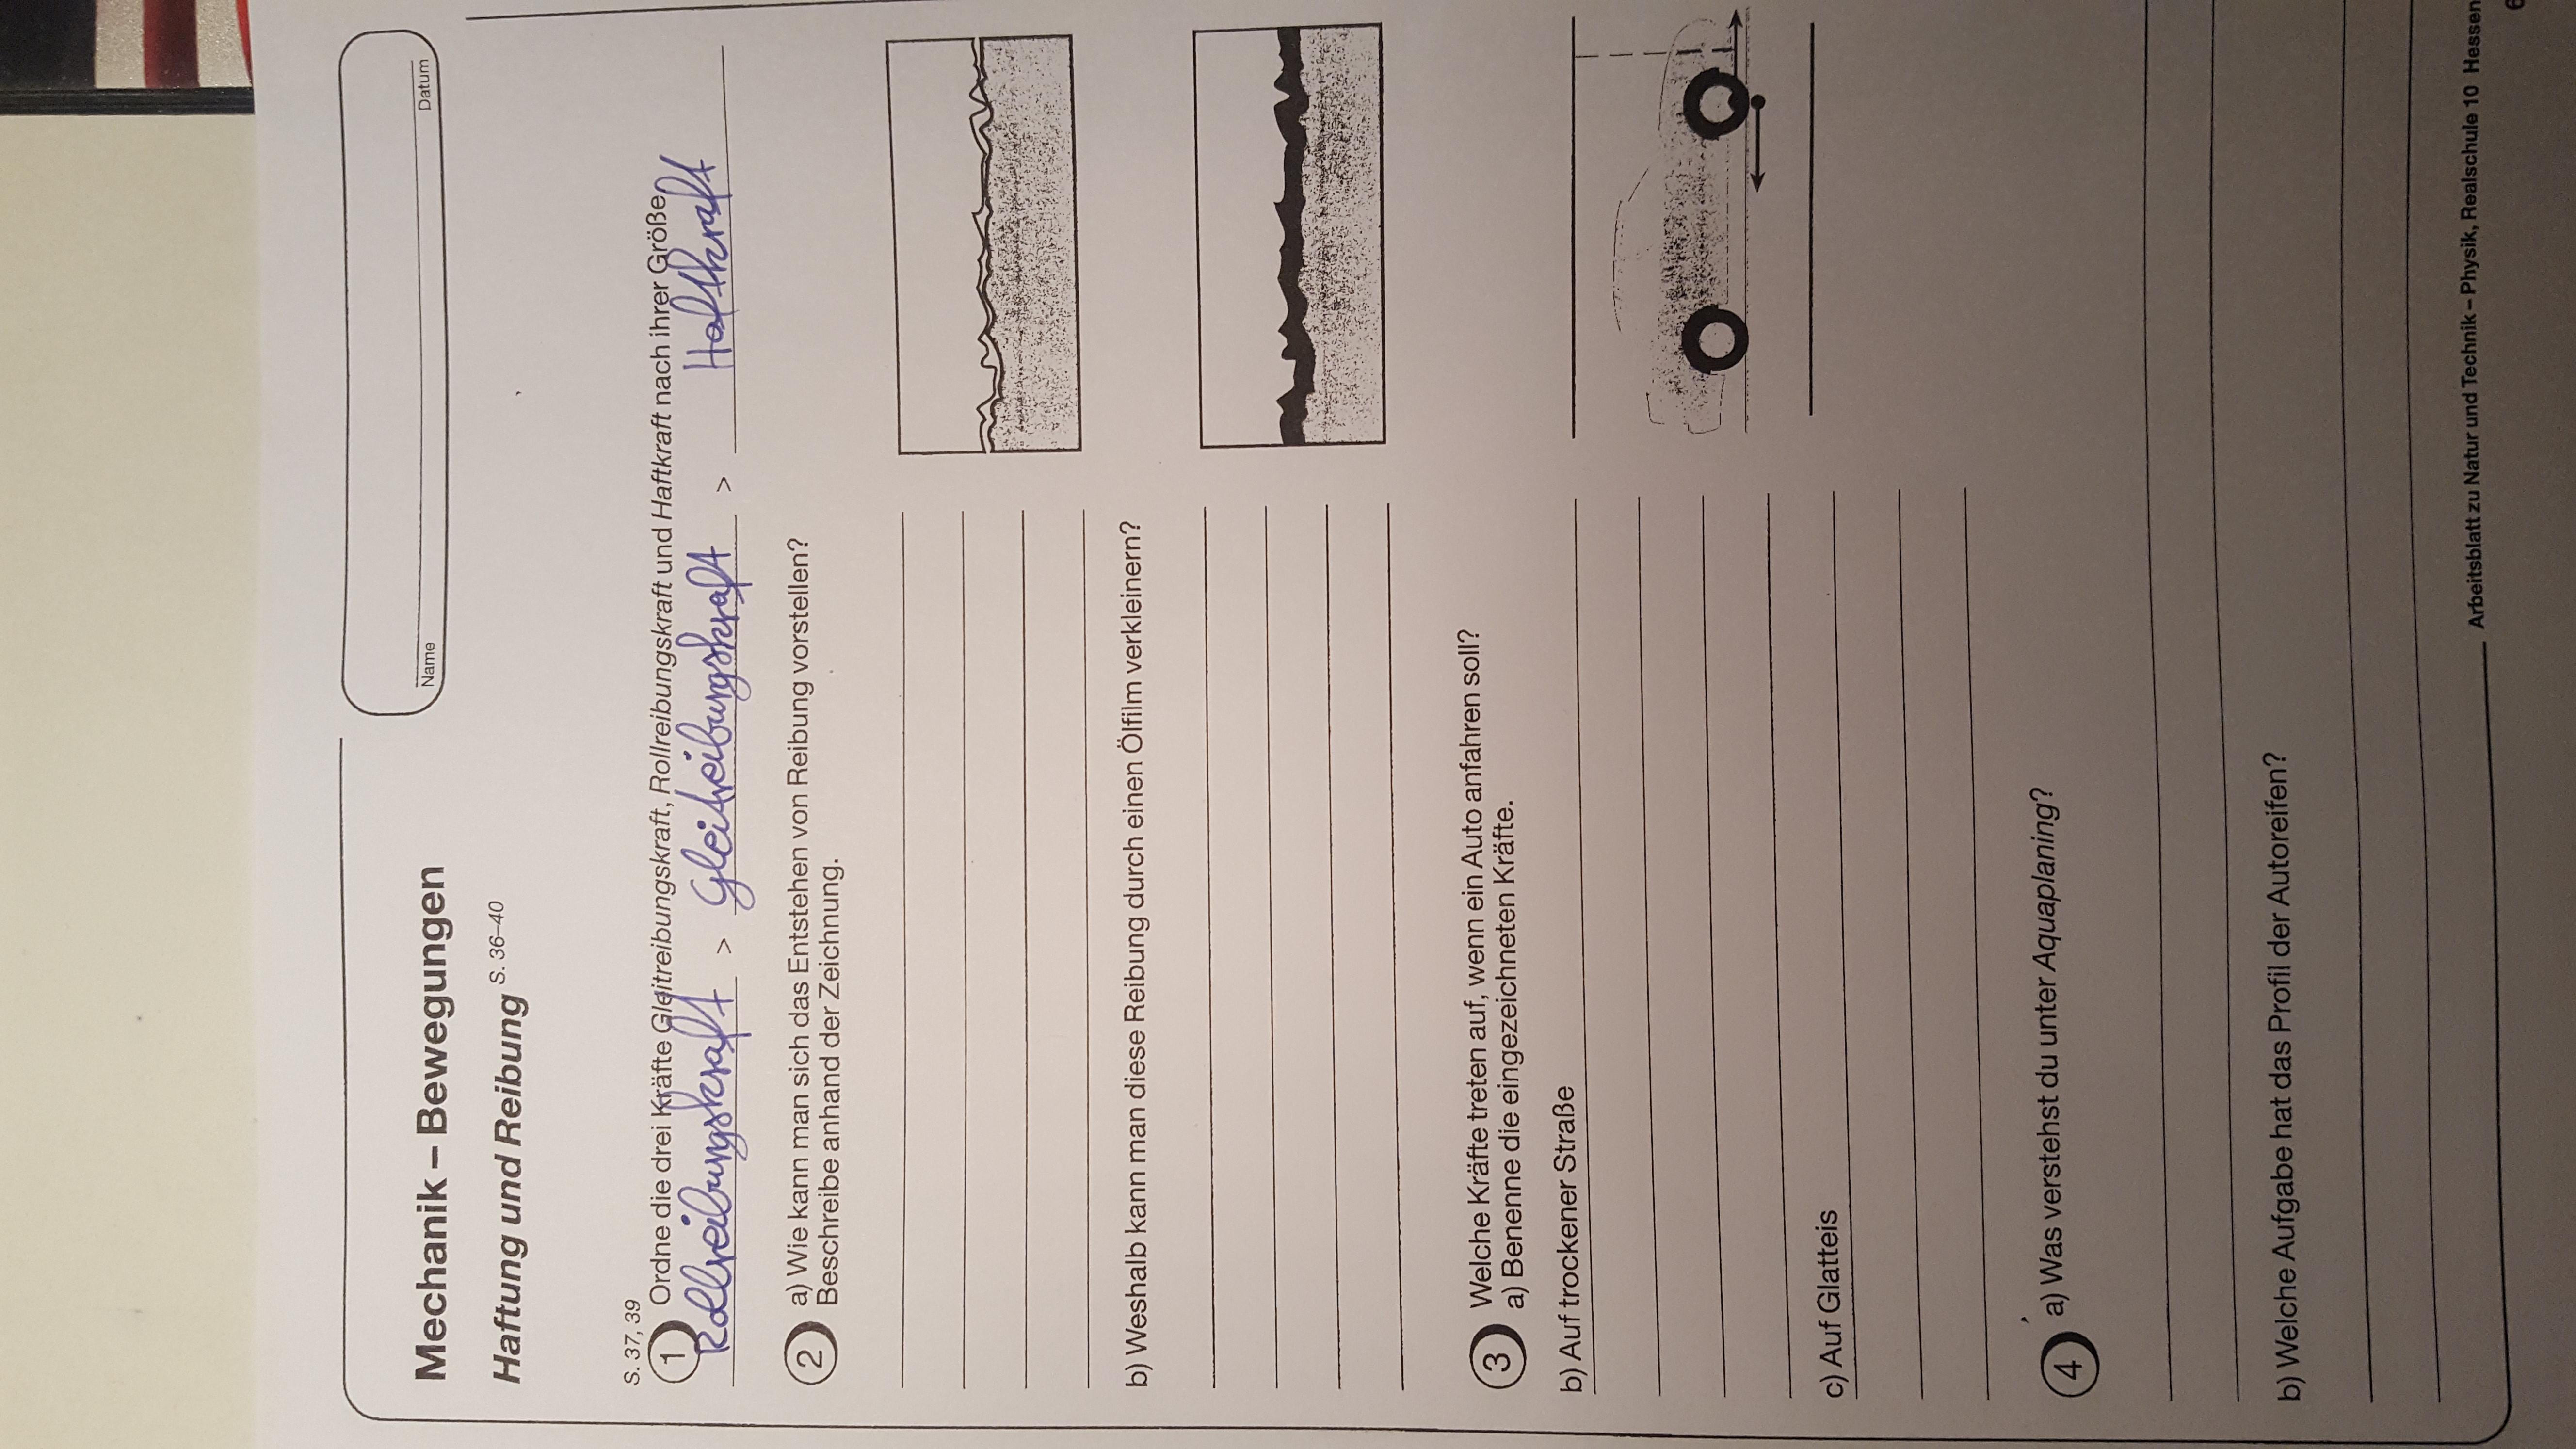 Kann mir jemand die Aufgabe in Physik erklären? (Schule, 10.Klasse, ha)